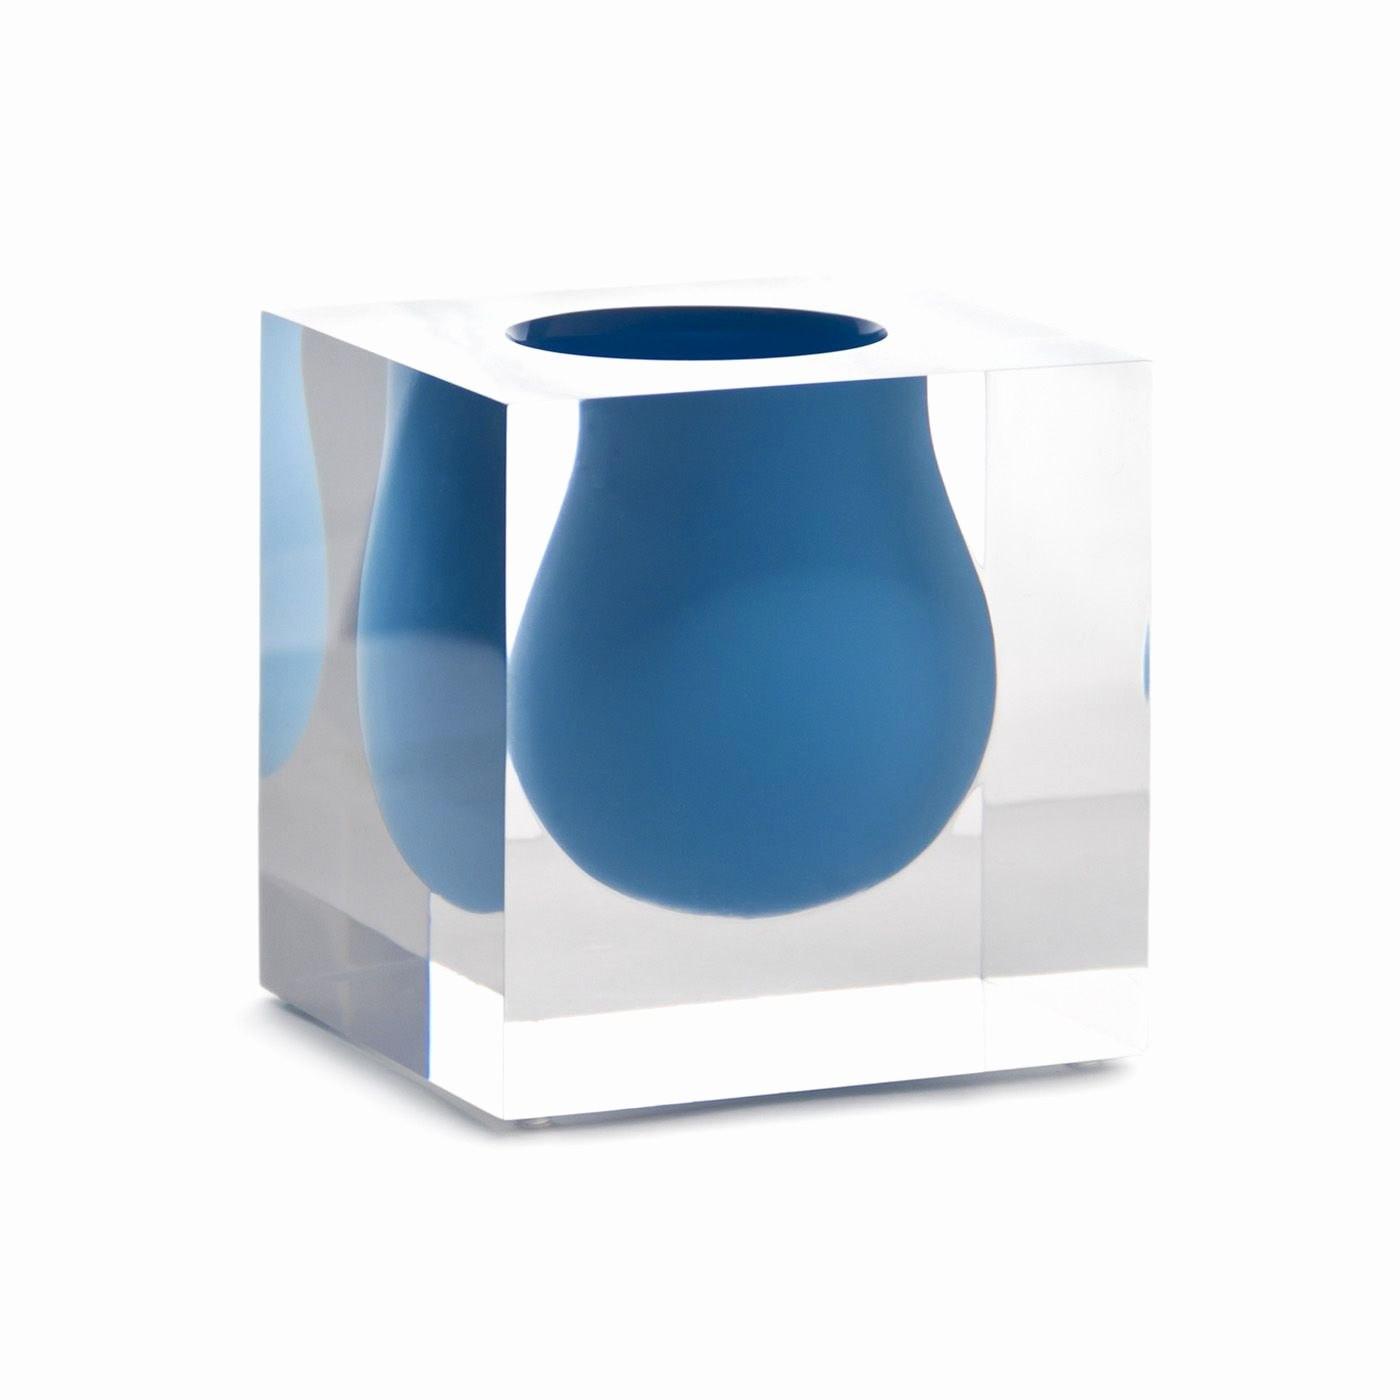 blue crystal vase of 20 unique very tall decorative vases bogekompresorturkiye com regarding vases for home decor unique home decor vases unique d dkbrw 5743 1h vases tall wood